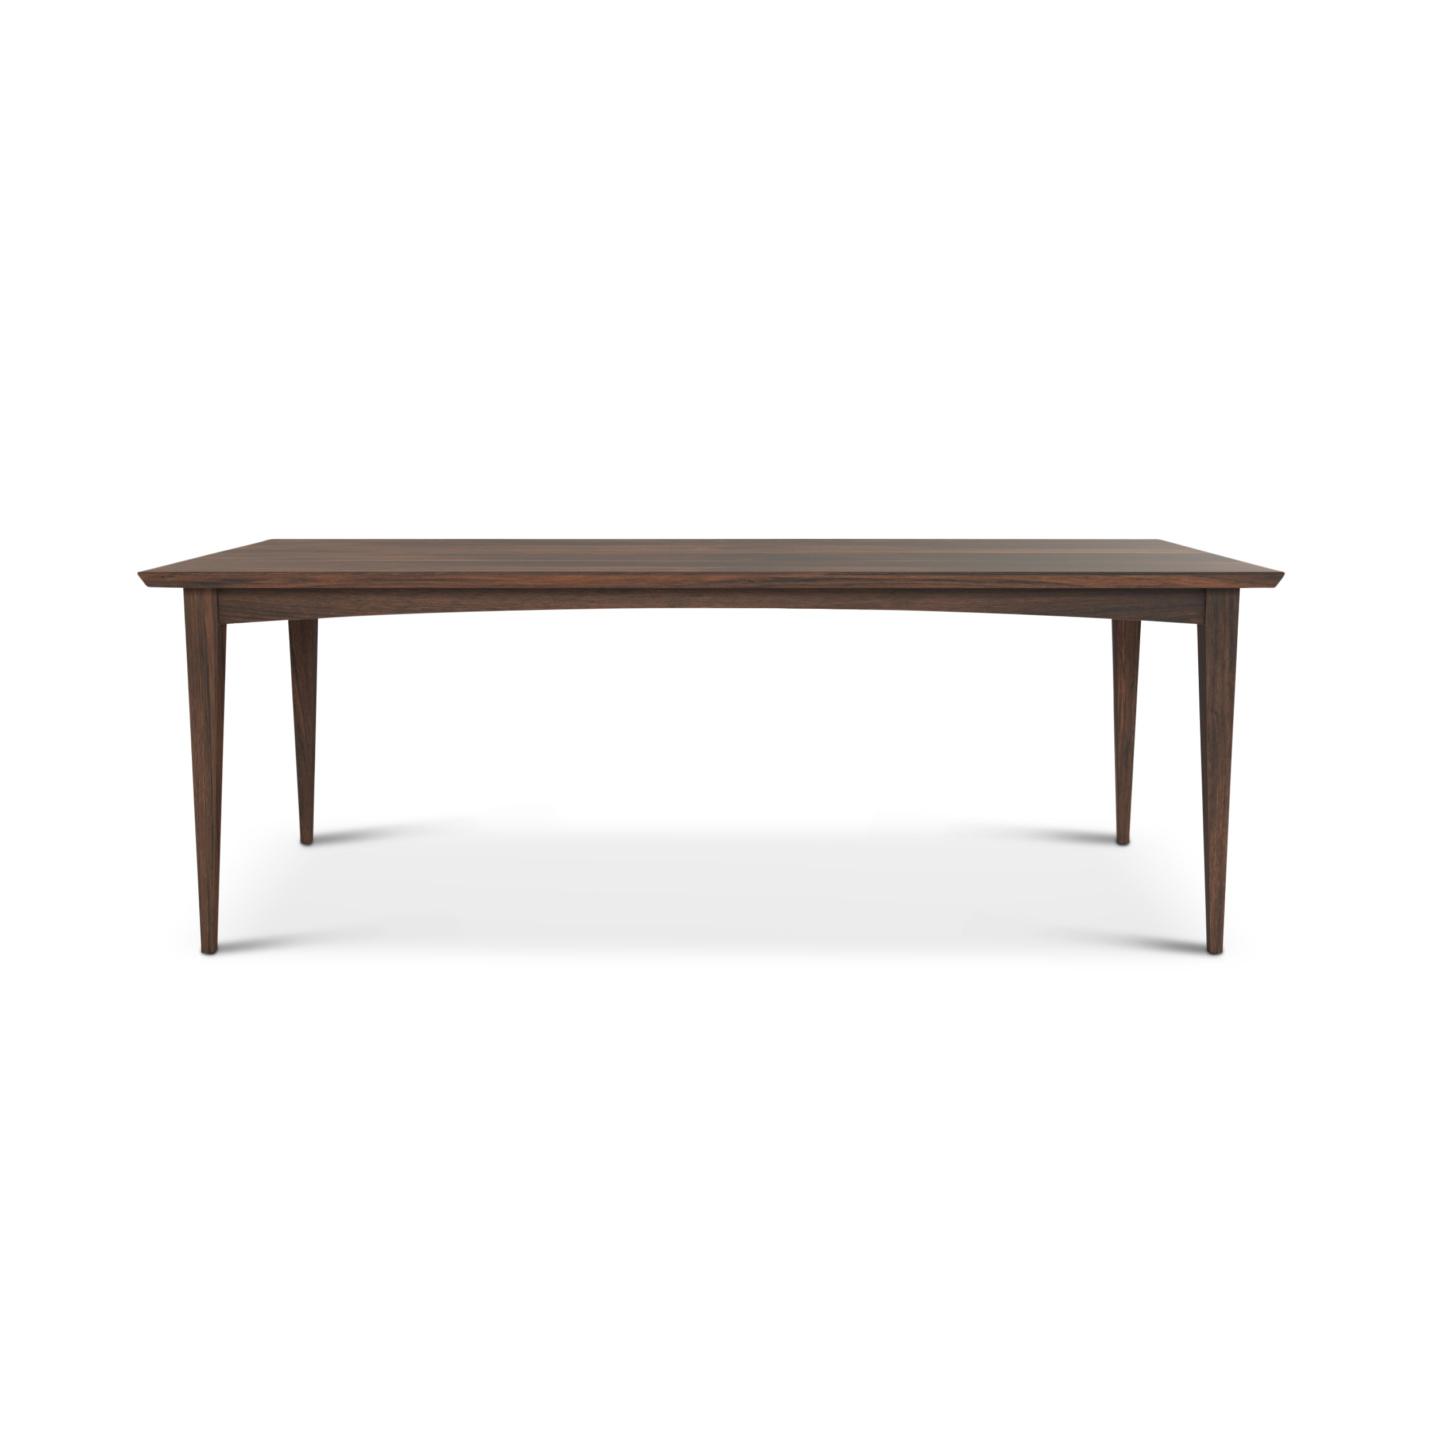 "84"" solid walnut mid-century modern table"